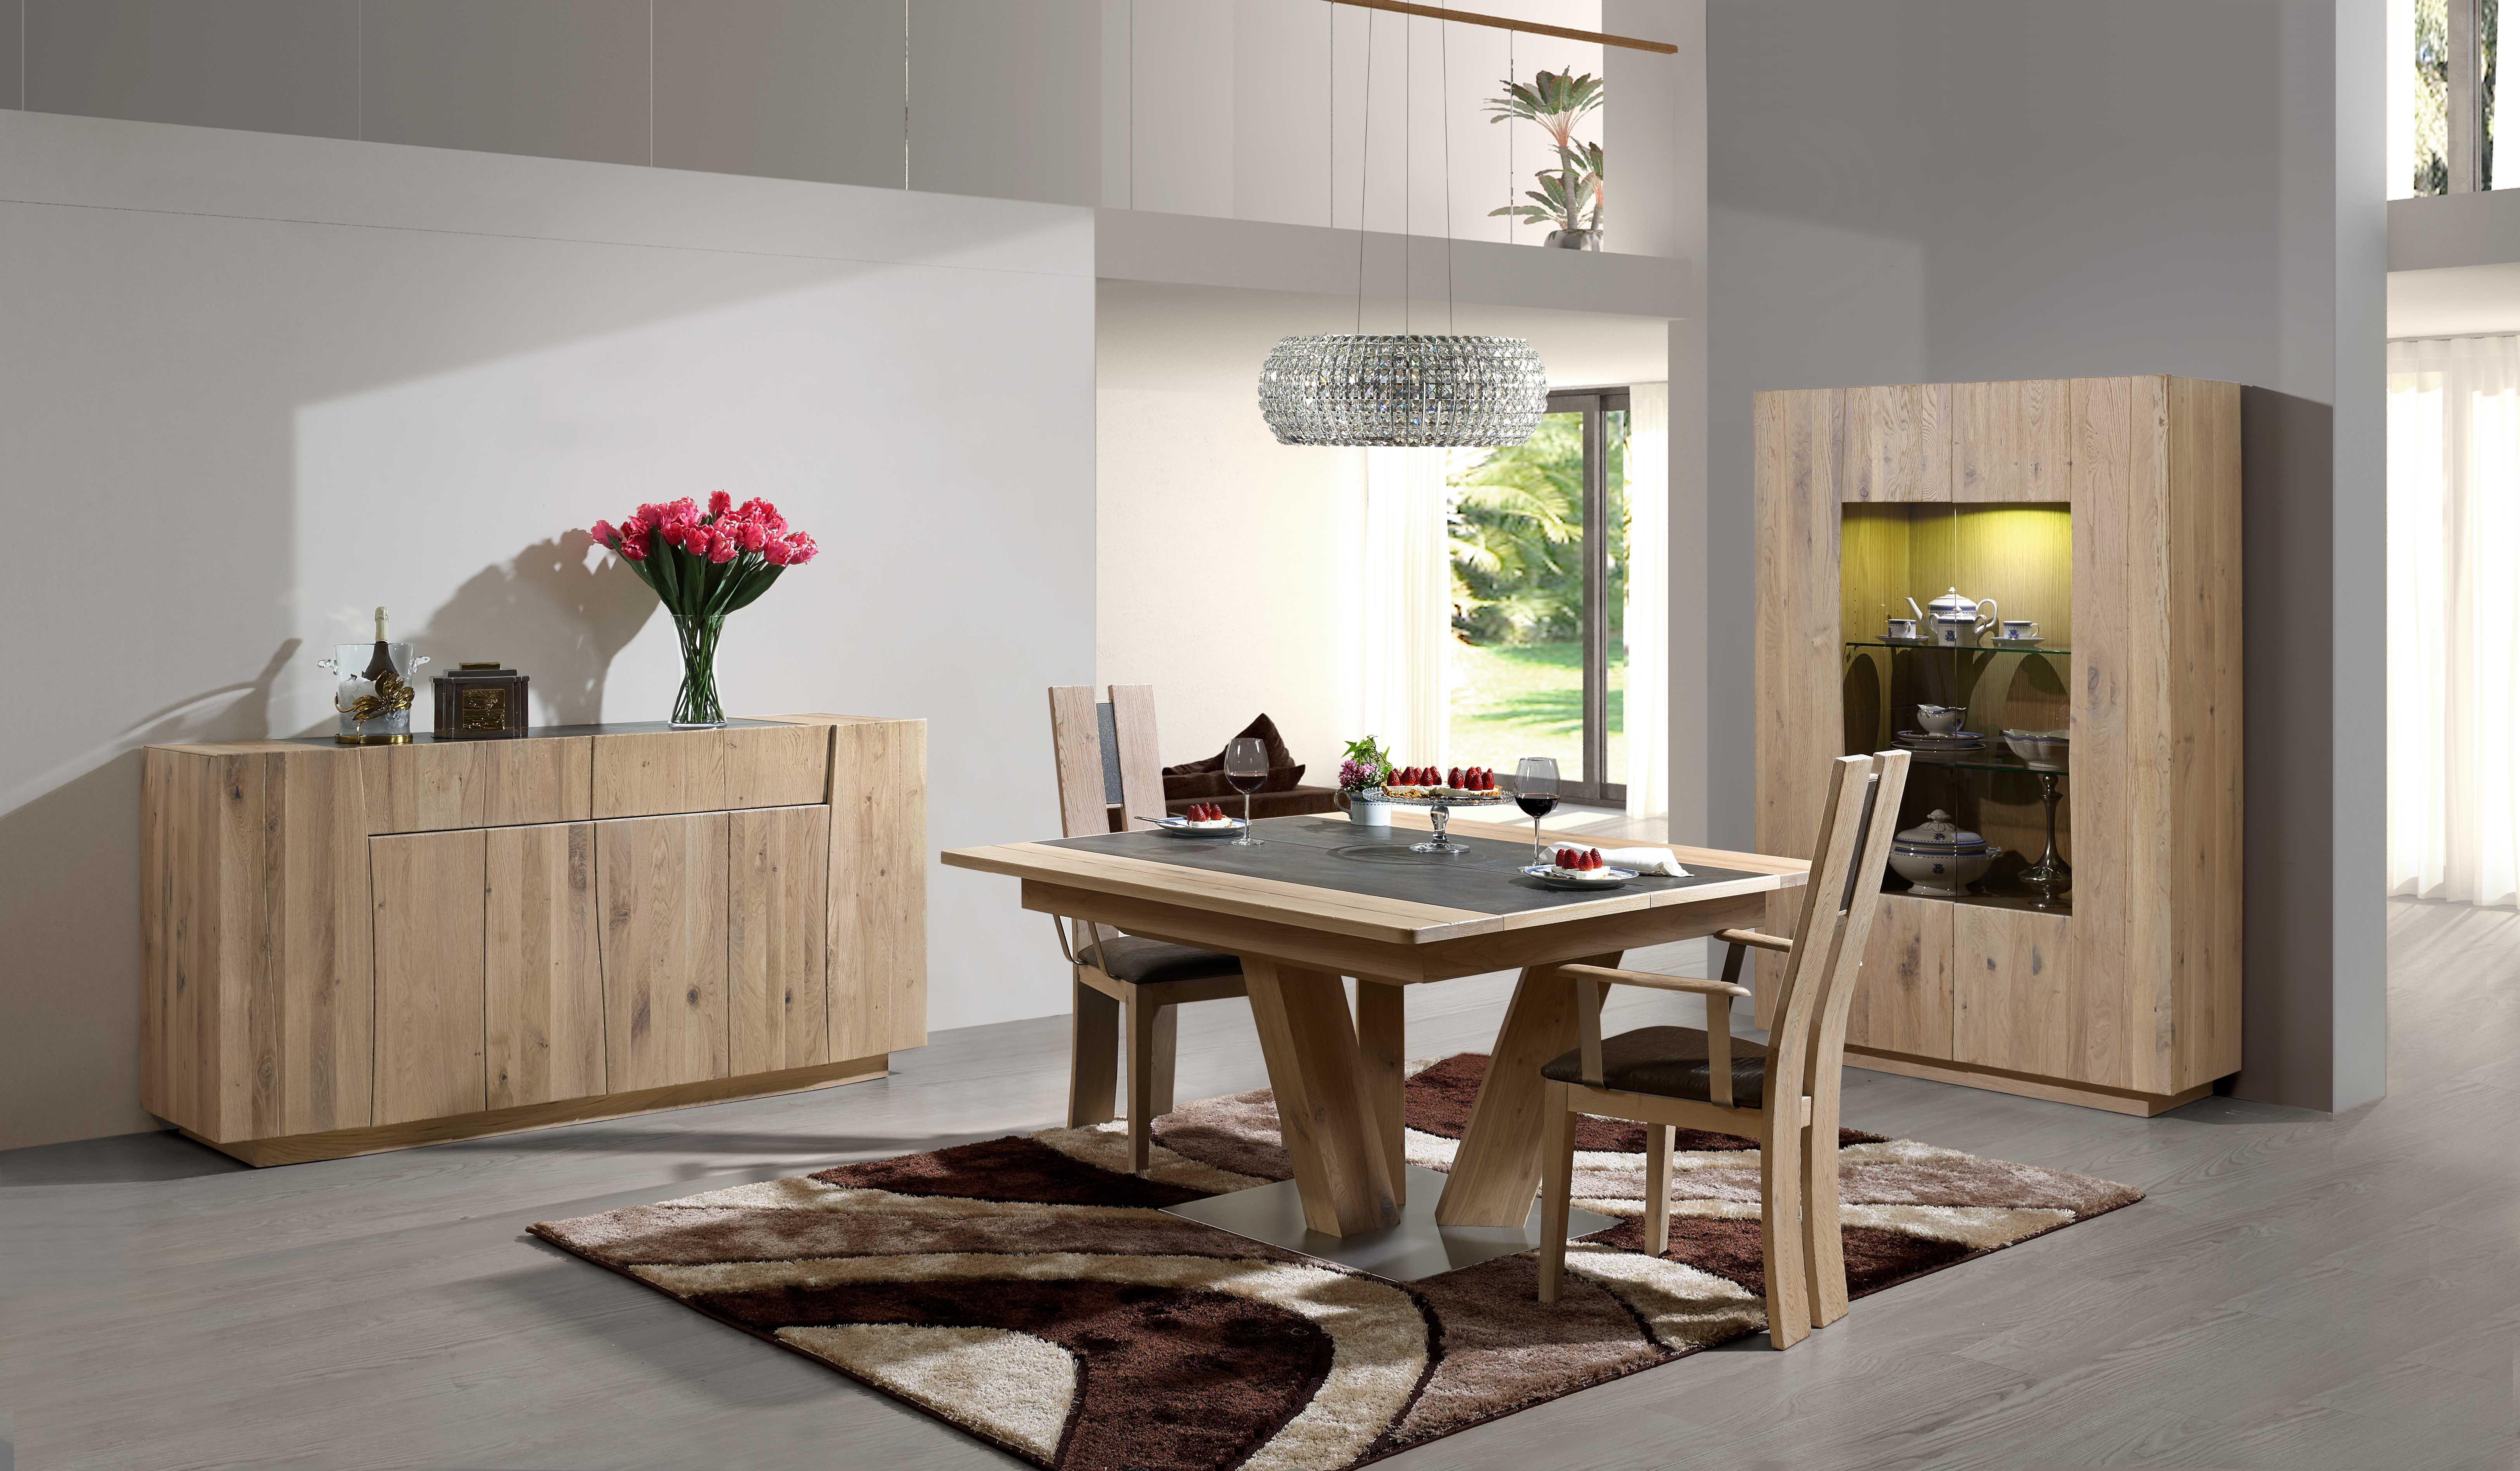 Salle manger contemporaine forest bois deco - Modele salle a manger ...